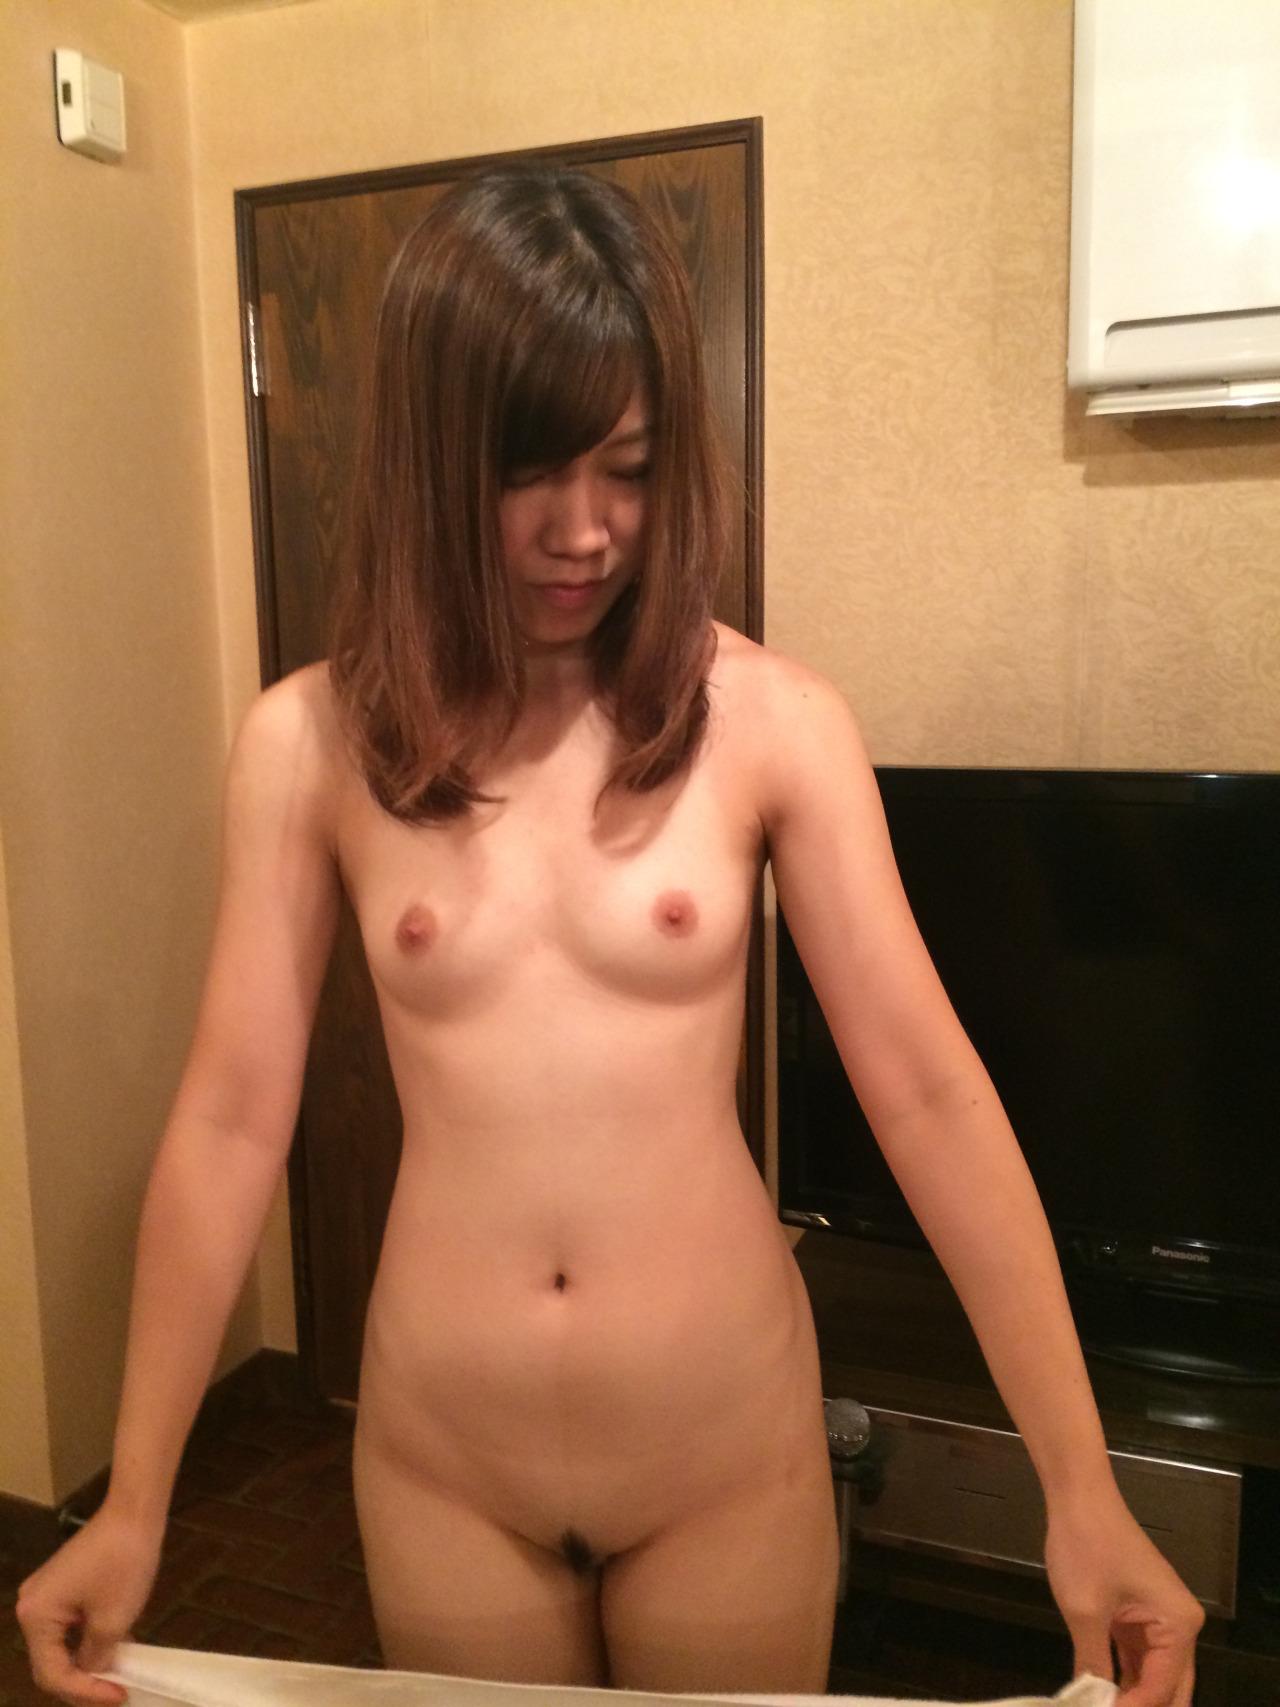 I like asian girls